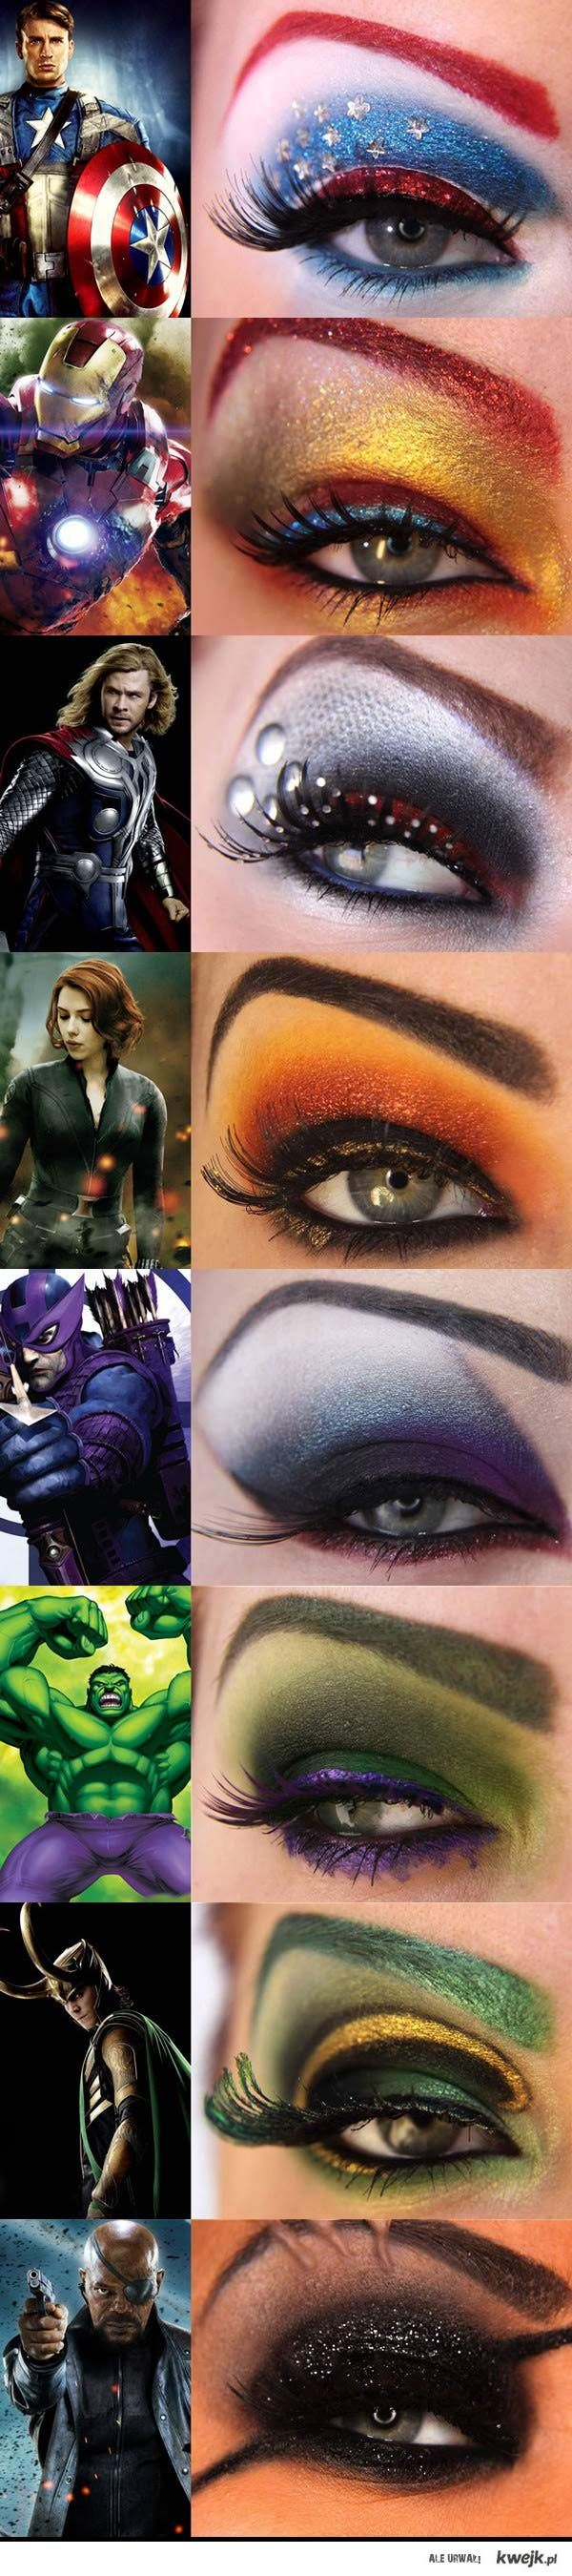 the avengers makeup